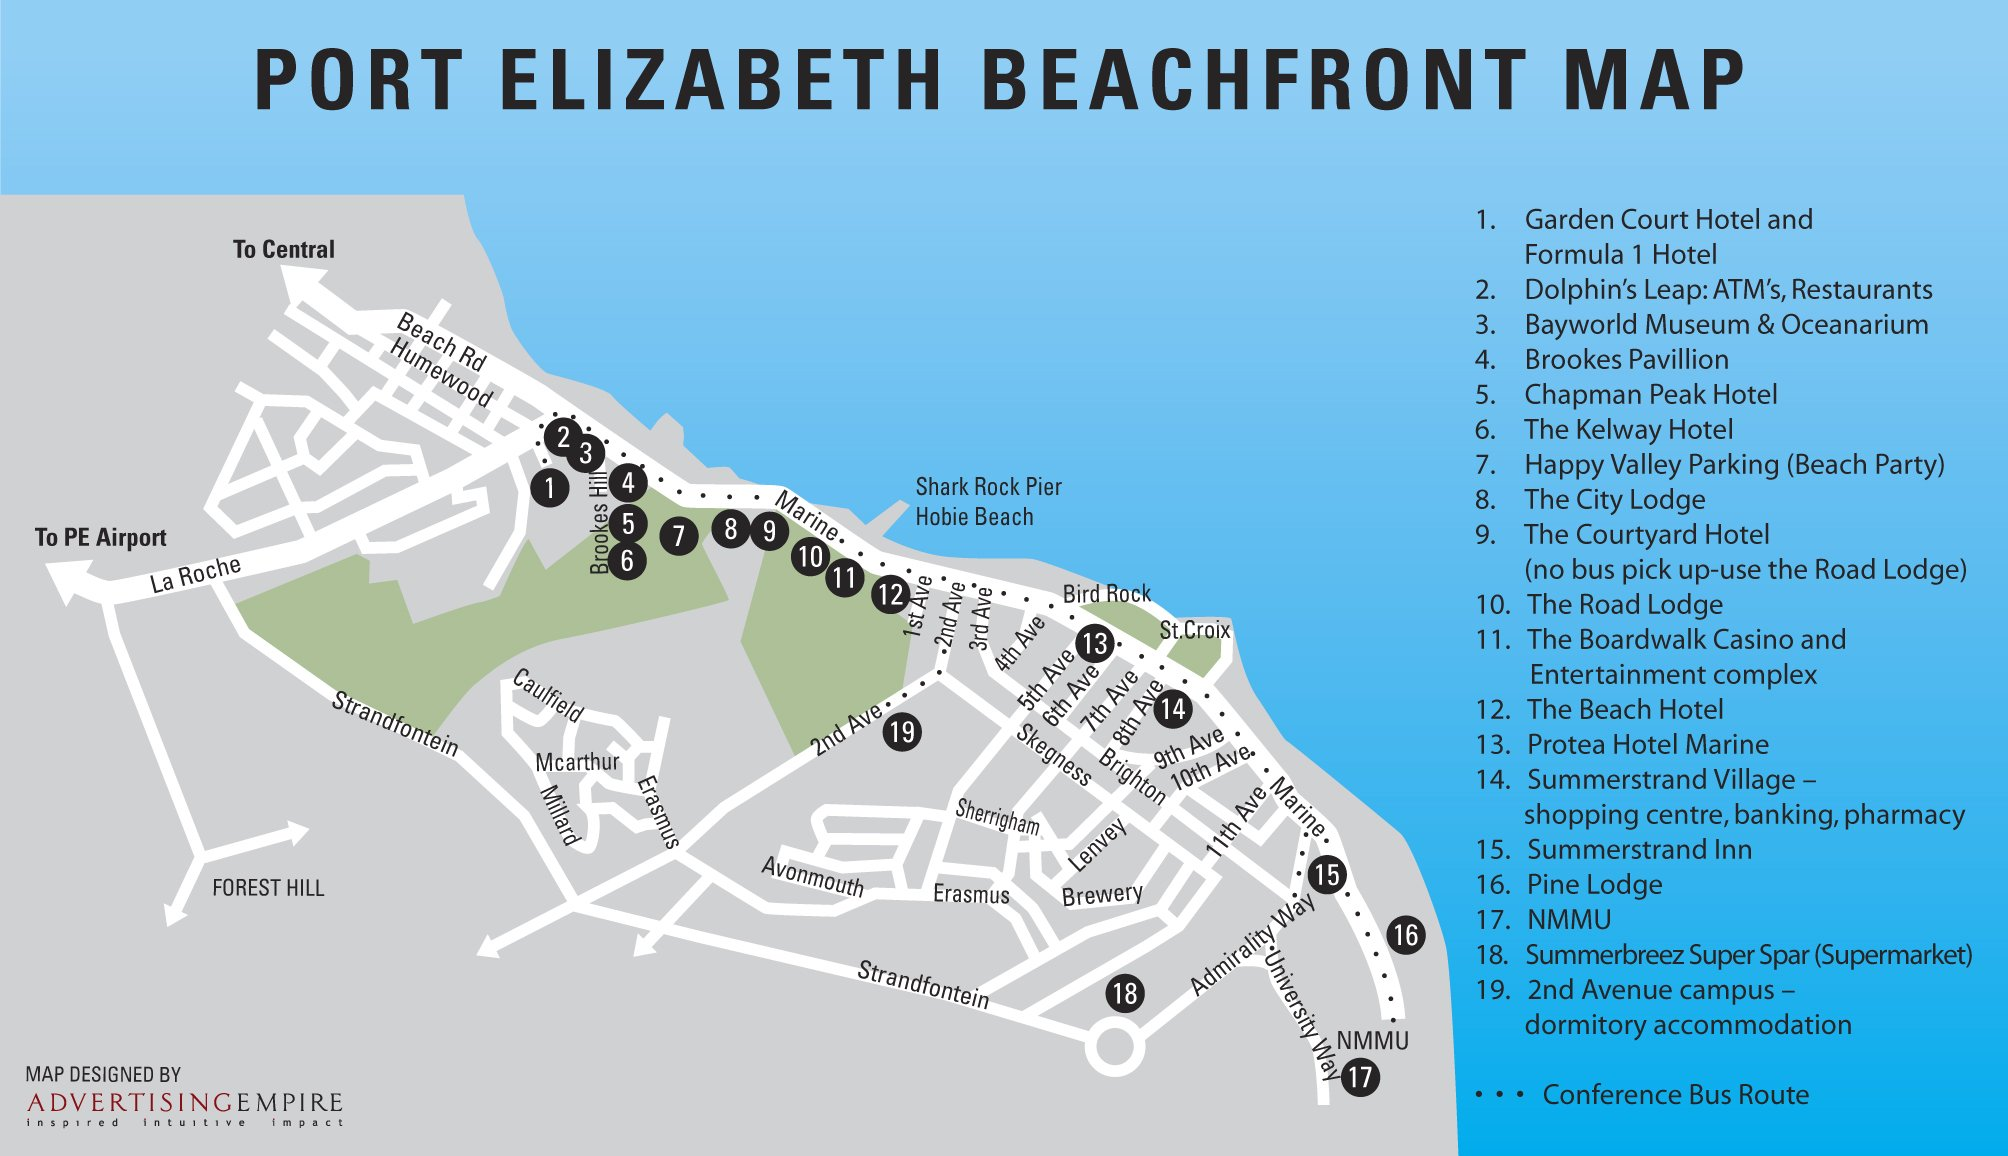 Port Elizabeth Beachfront Map Port Elizabeth South Africa mappery